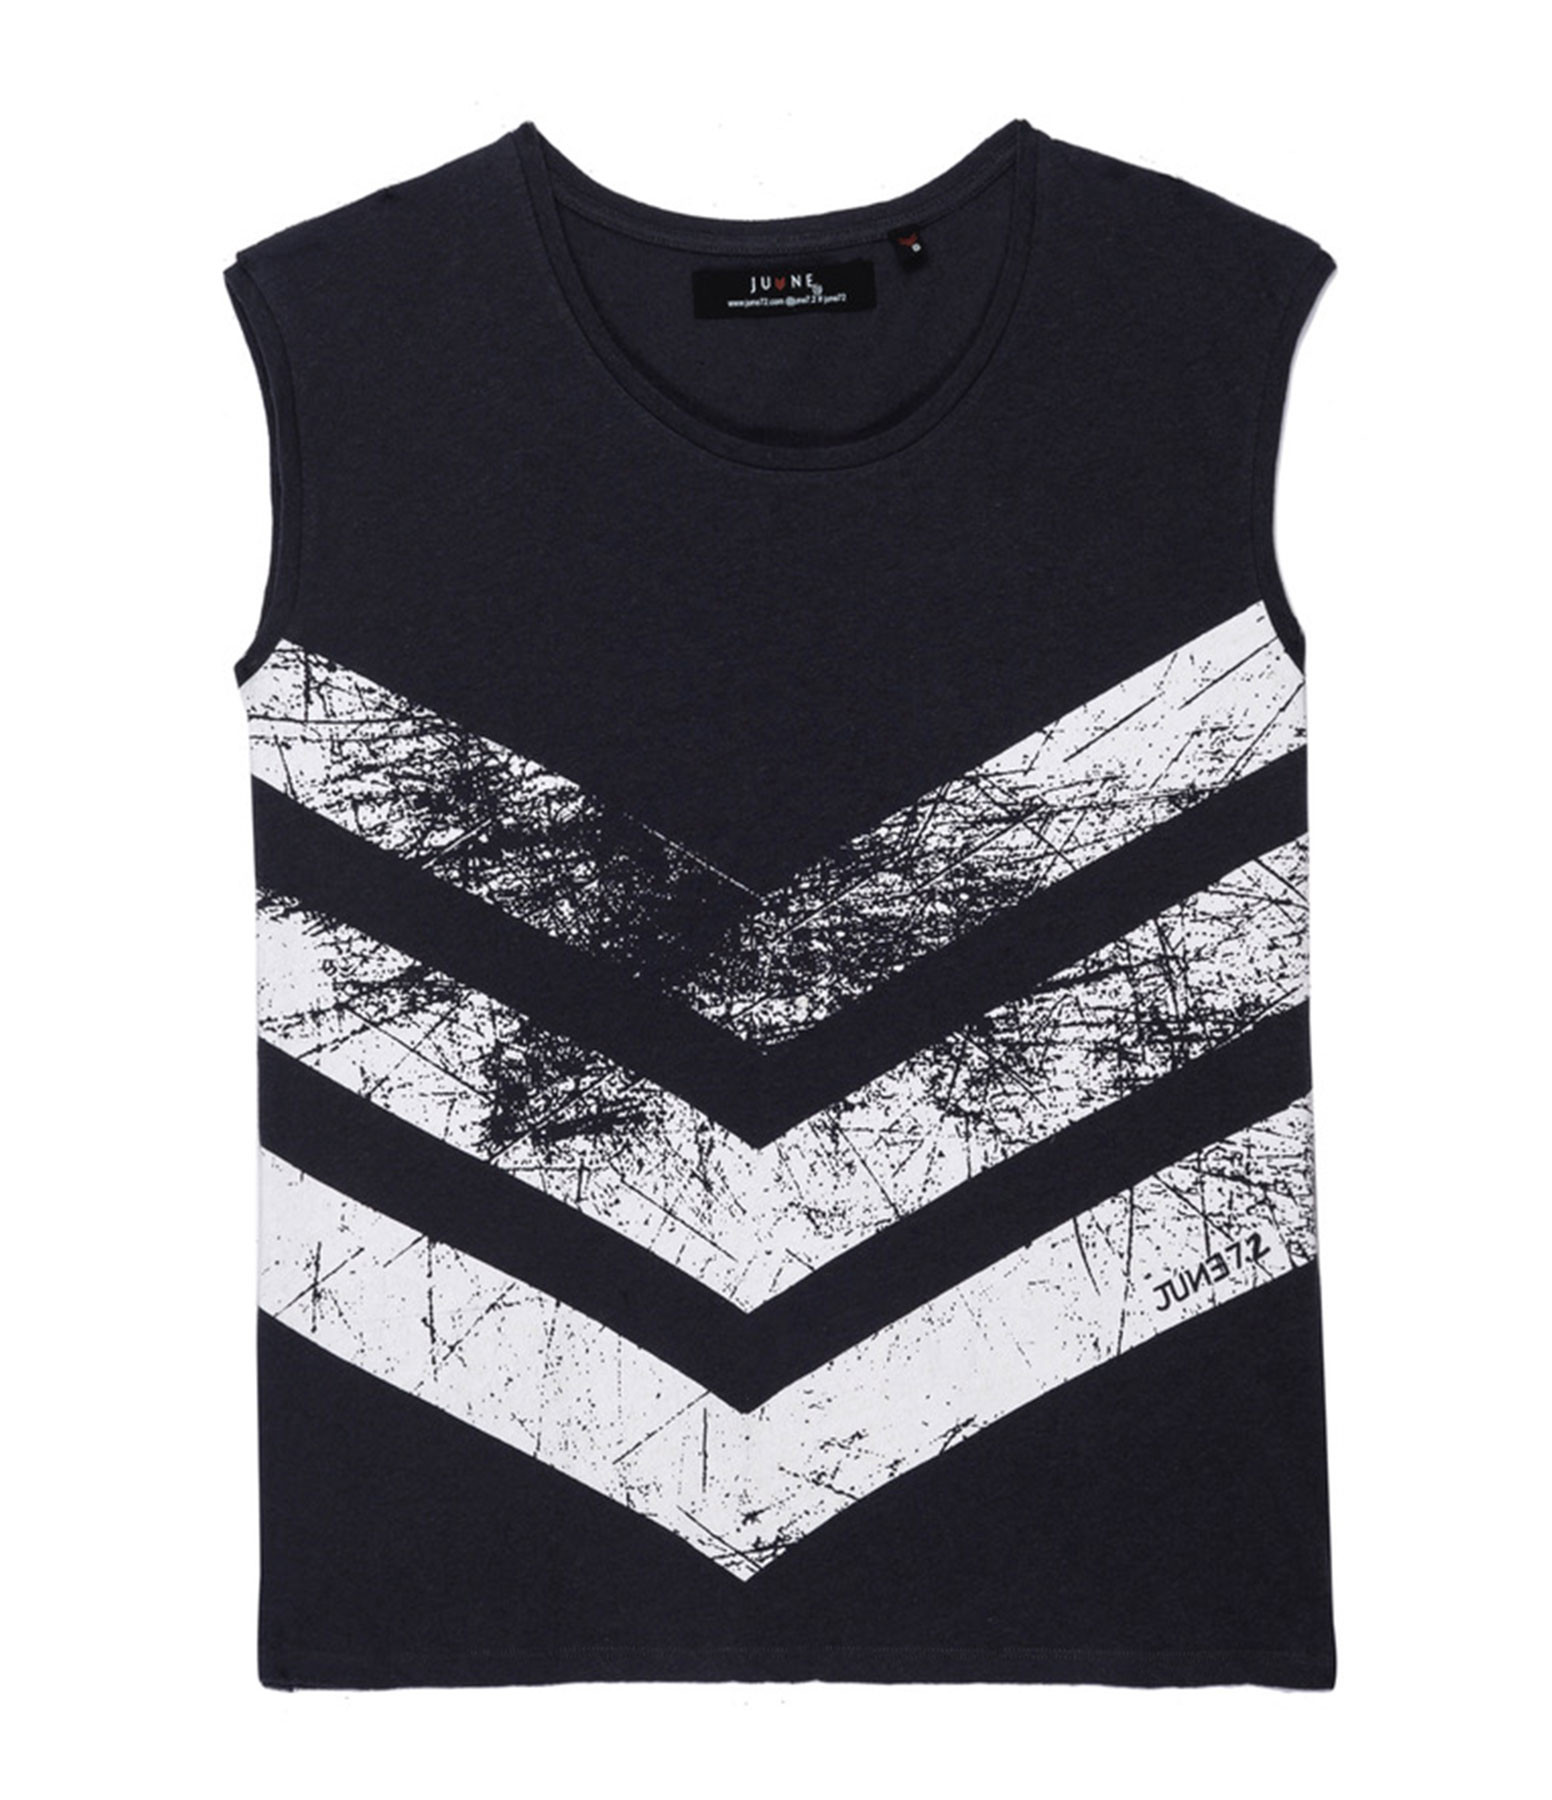 JUNE 7.2 - Tee-shirt Ruby Coton Lin Charbon Logo Blanc